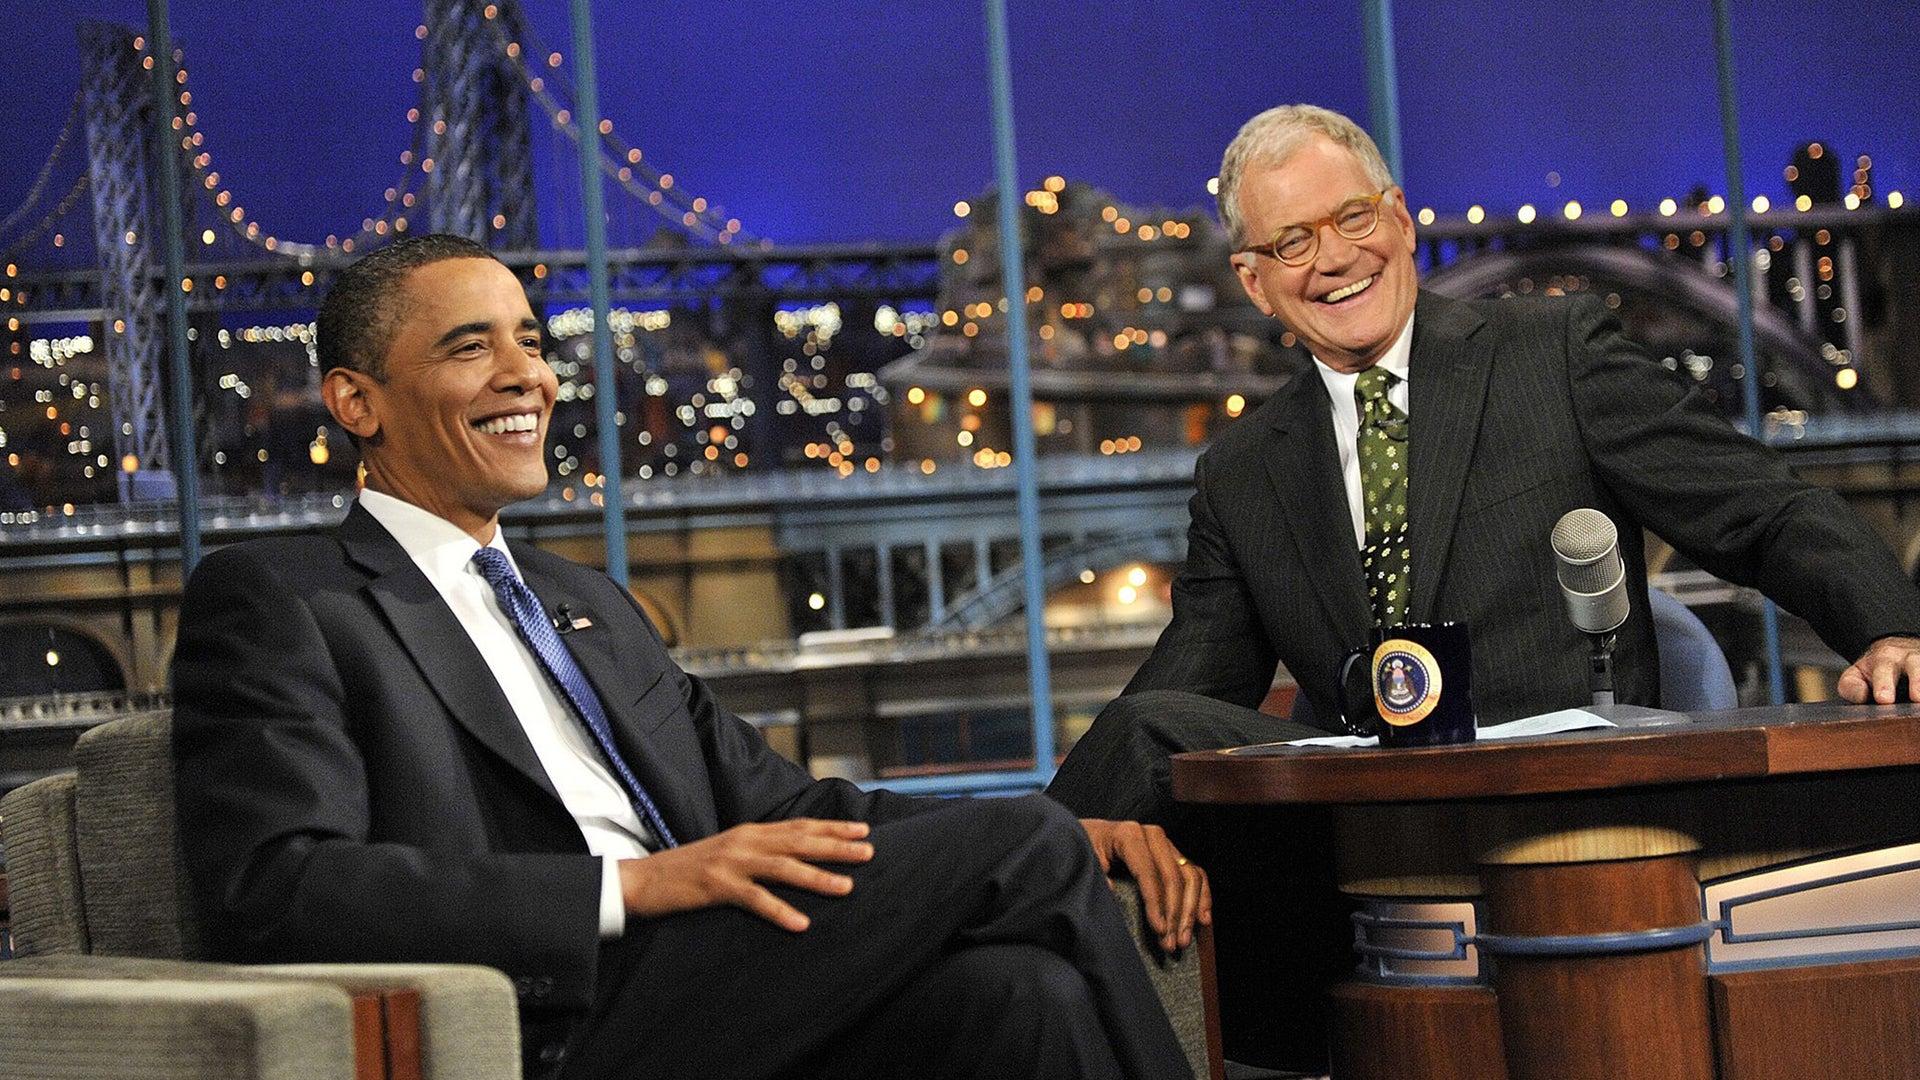 Barack Obama, David Letterman, The Late Show